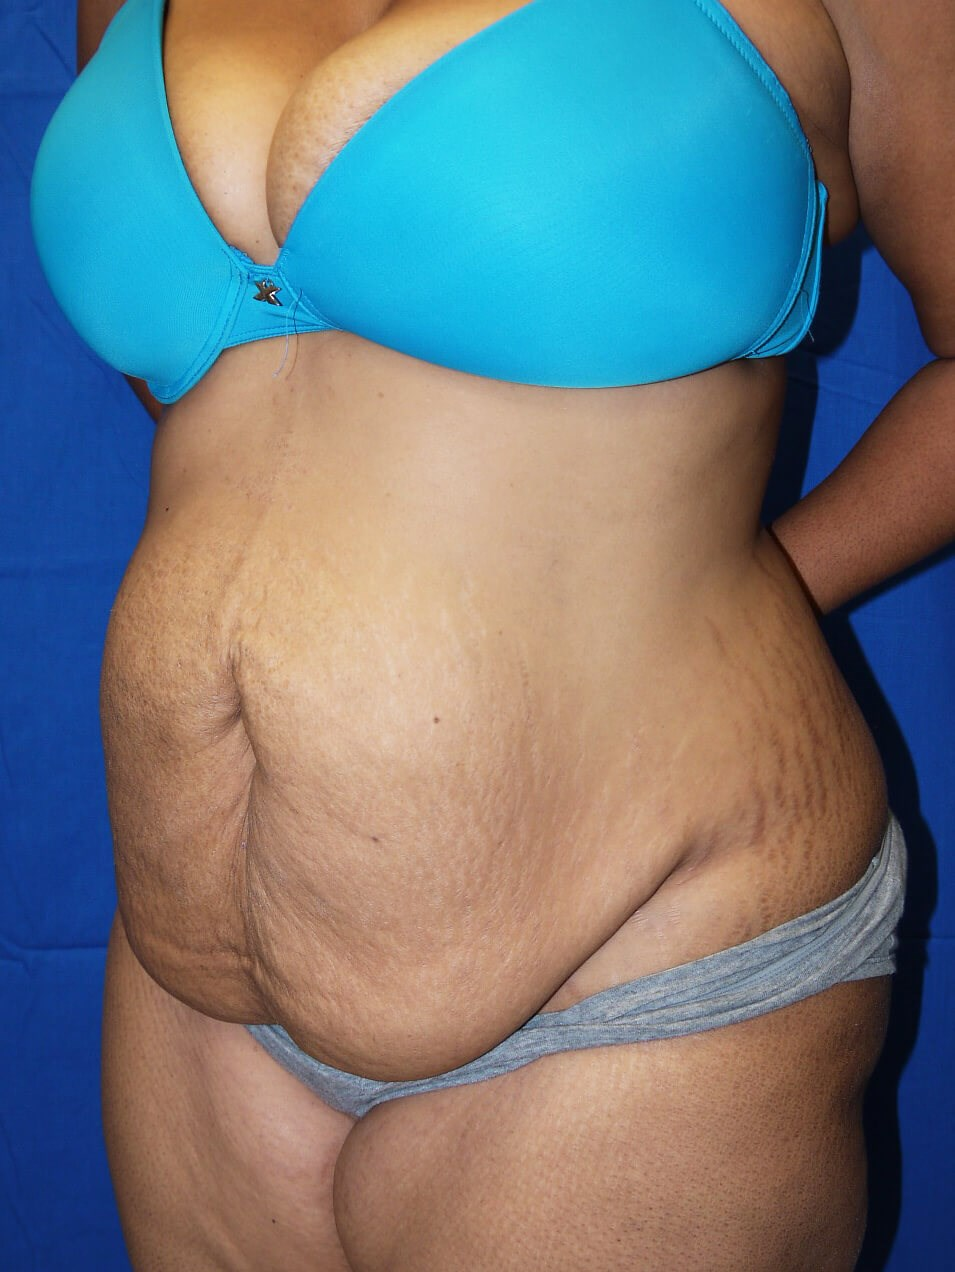 Before weight loss surgery Left Oblique View - Left Oblique View